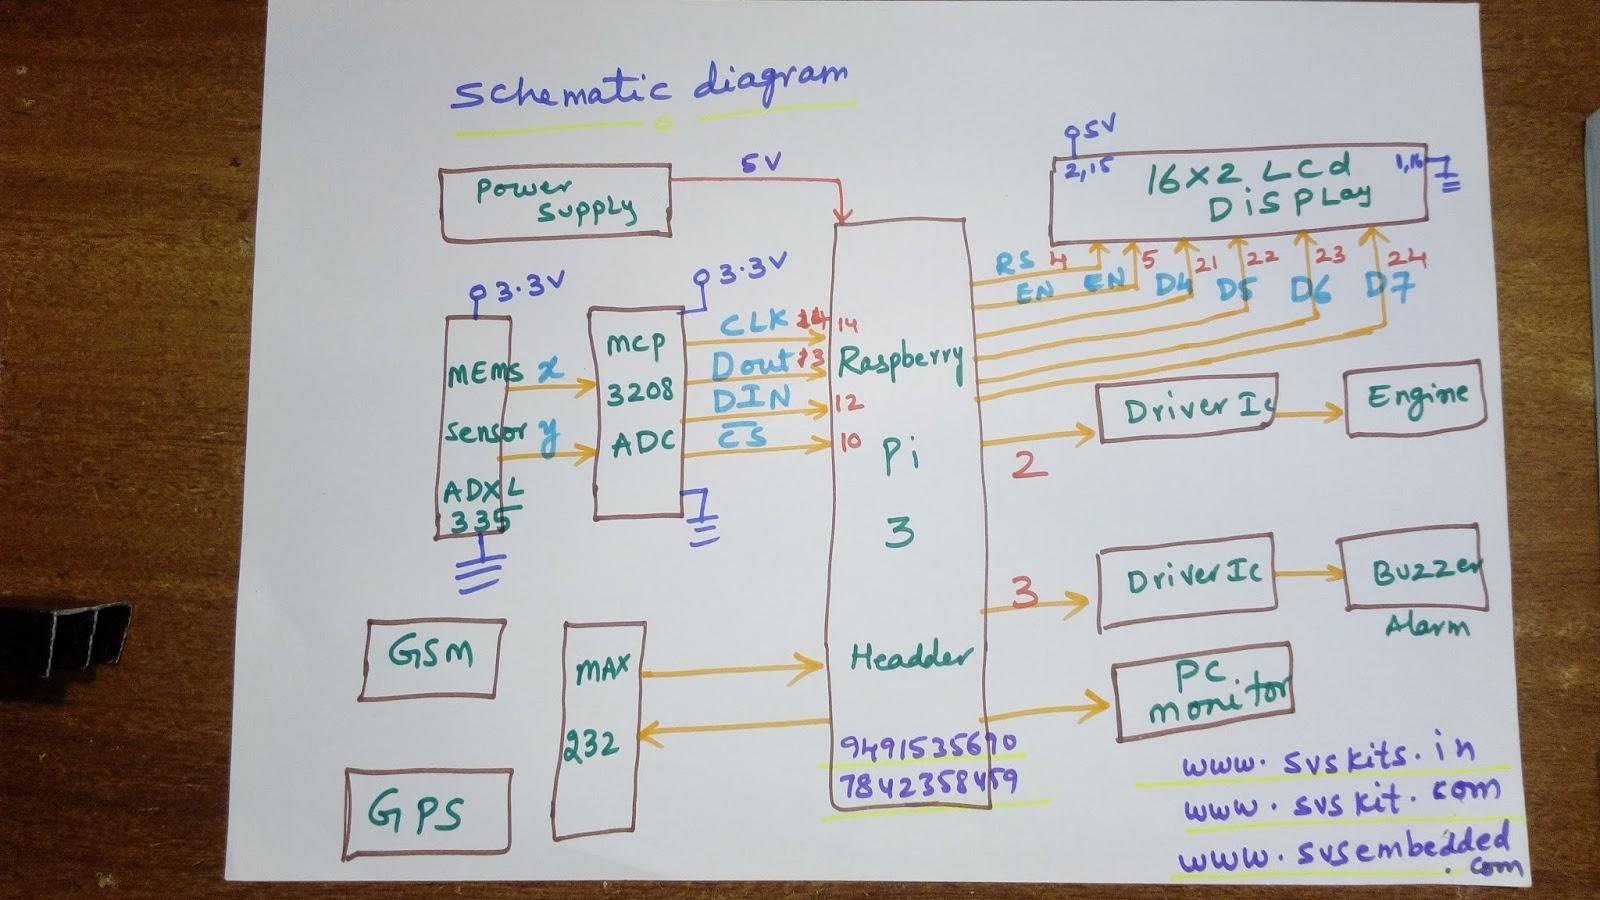 Unique Accident Diagram Software Illustration - Simple Wiring ...